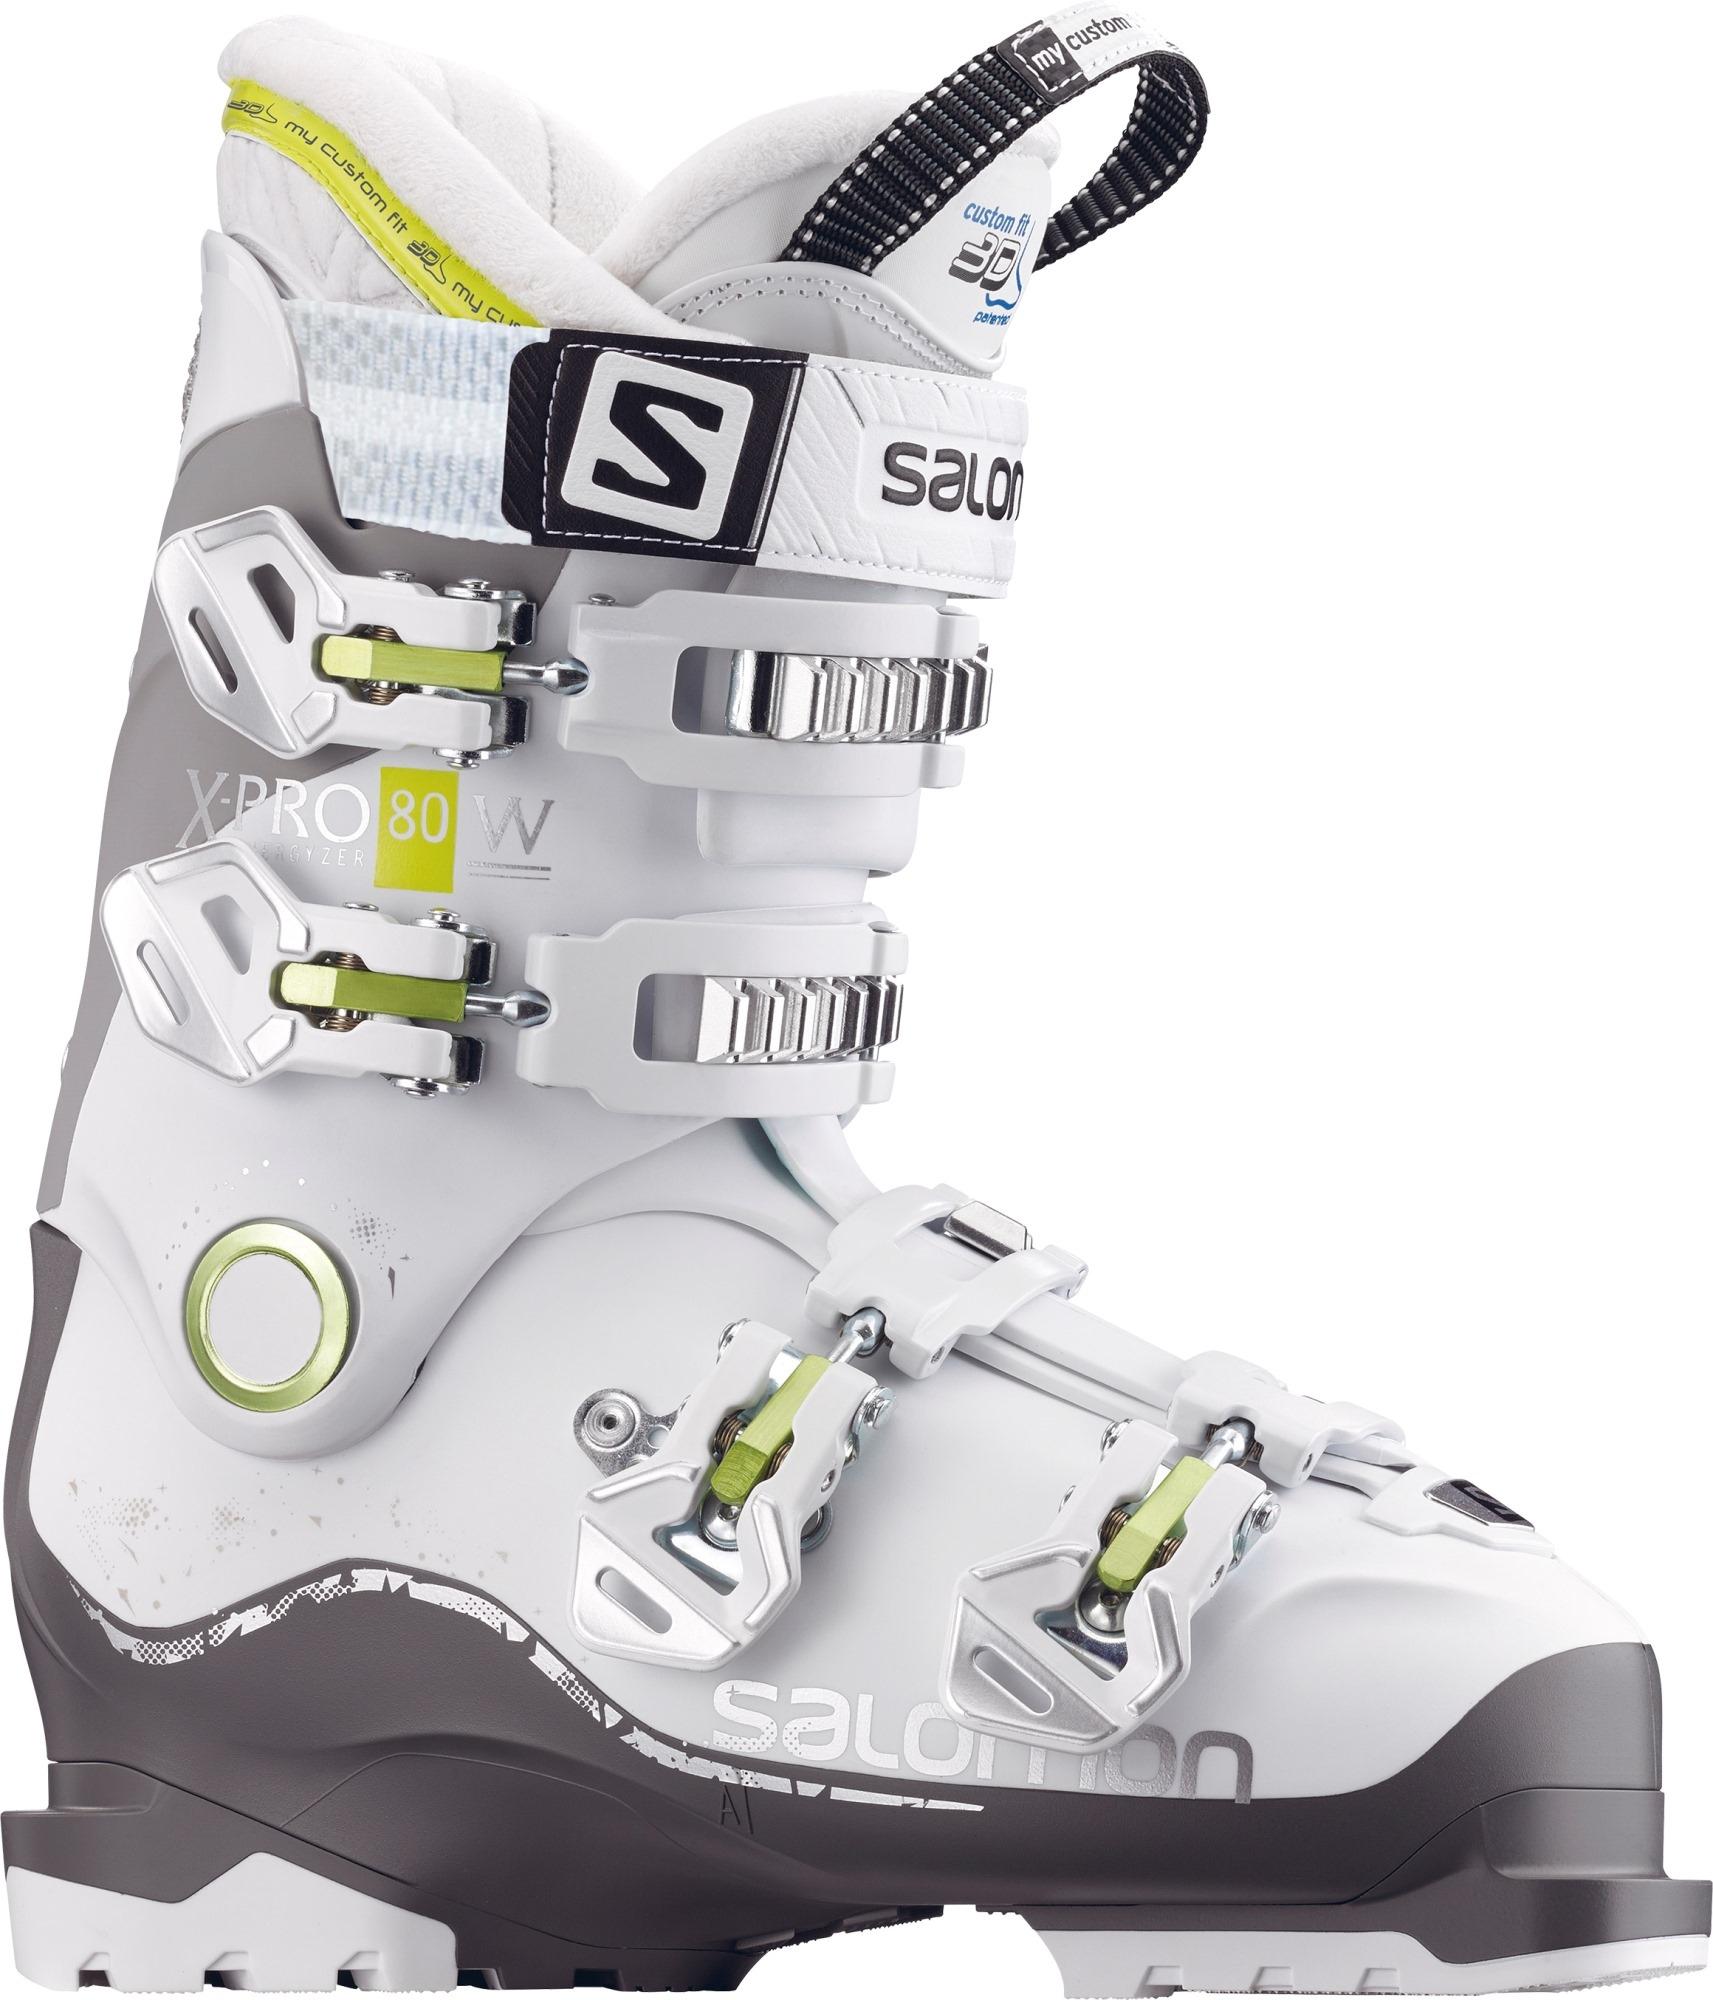 Salomon Pro Ski X De 27 80 Chaussures Taille fgb7Y6y